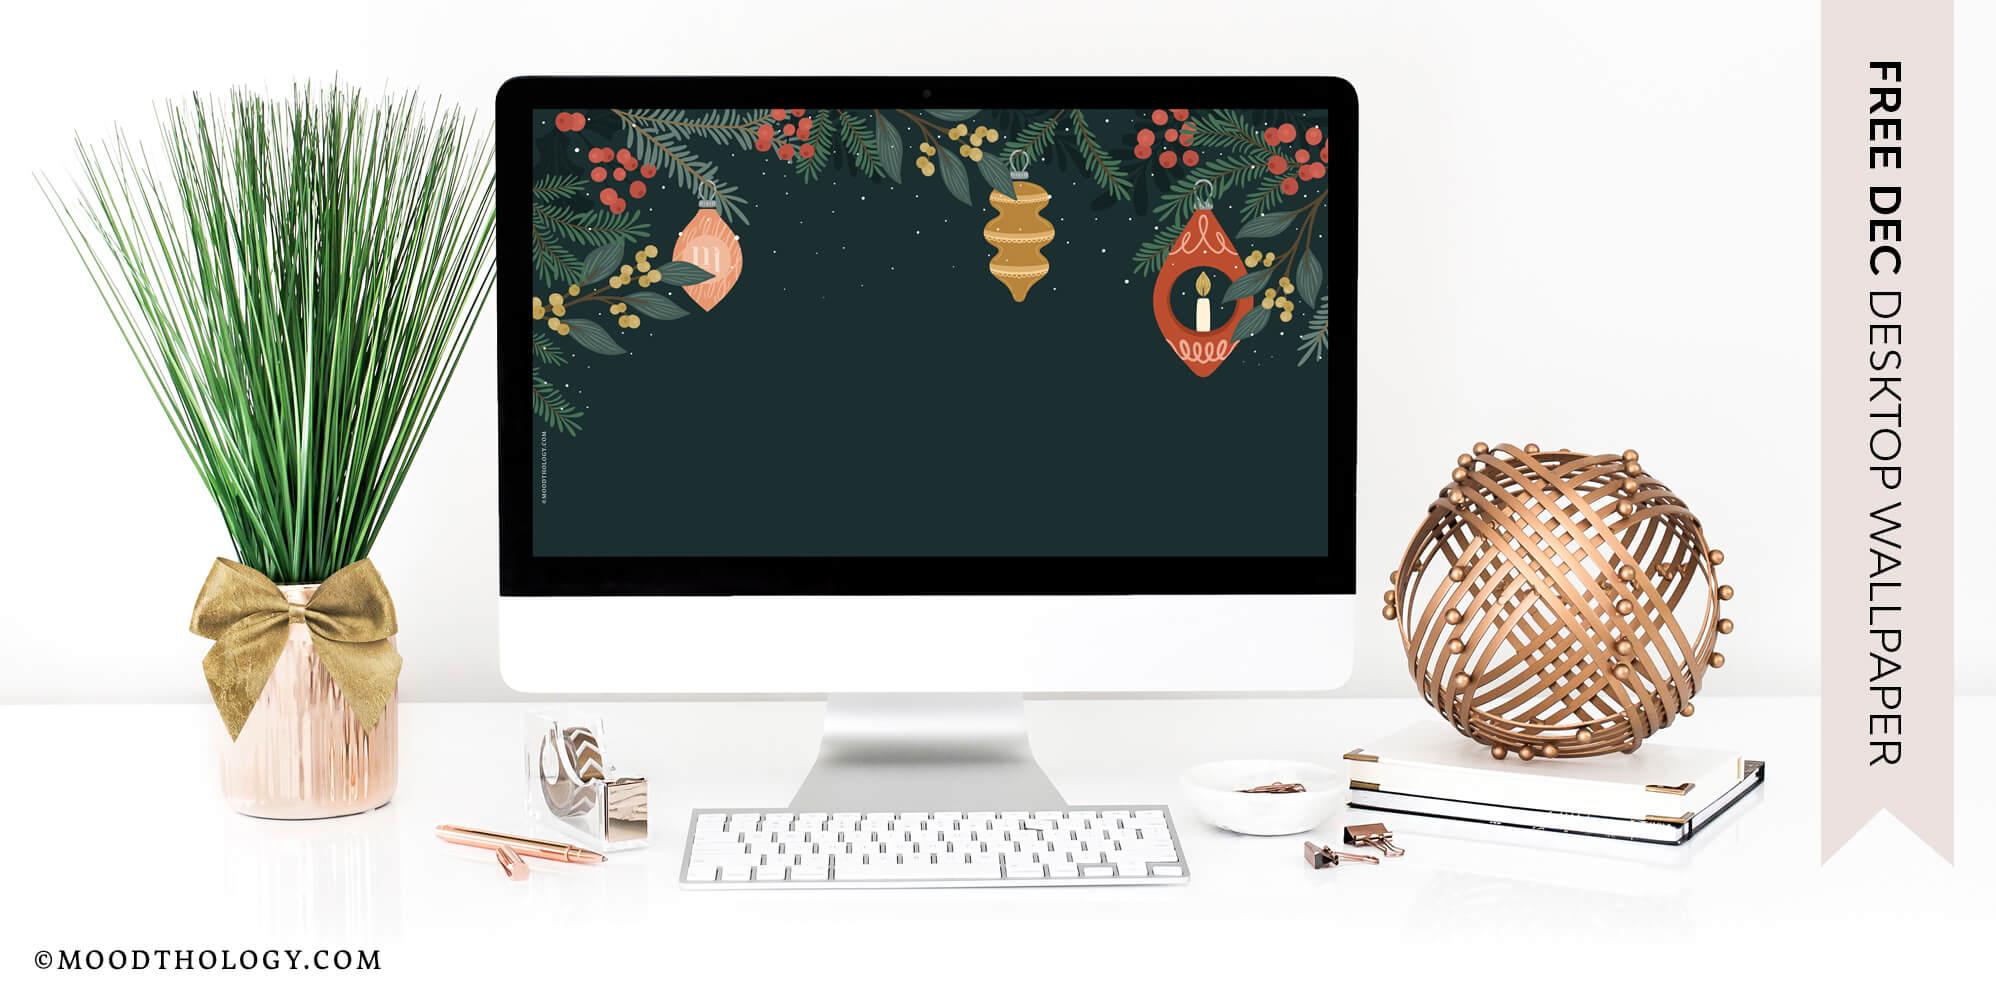 Free December 2020 Desktop Wallpaper Moodthology Papery